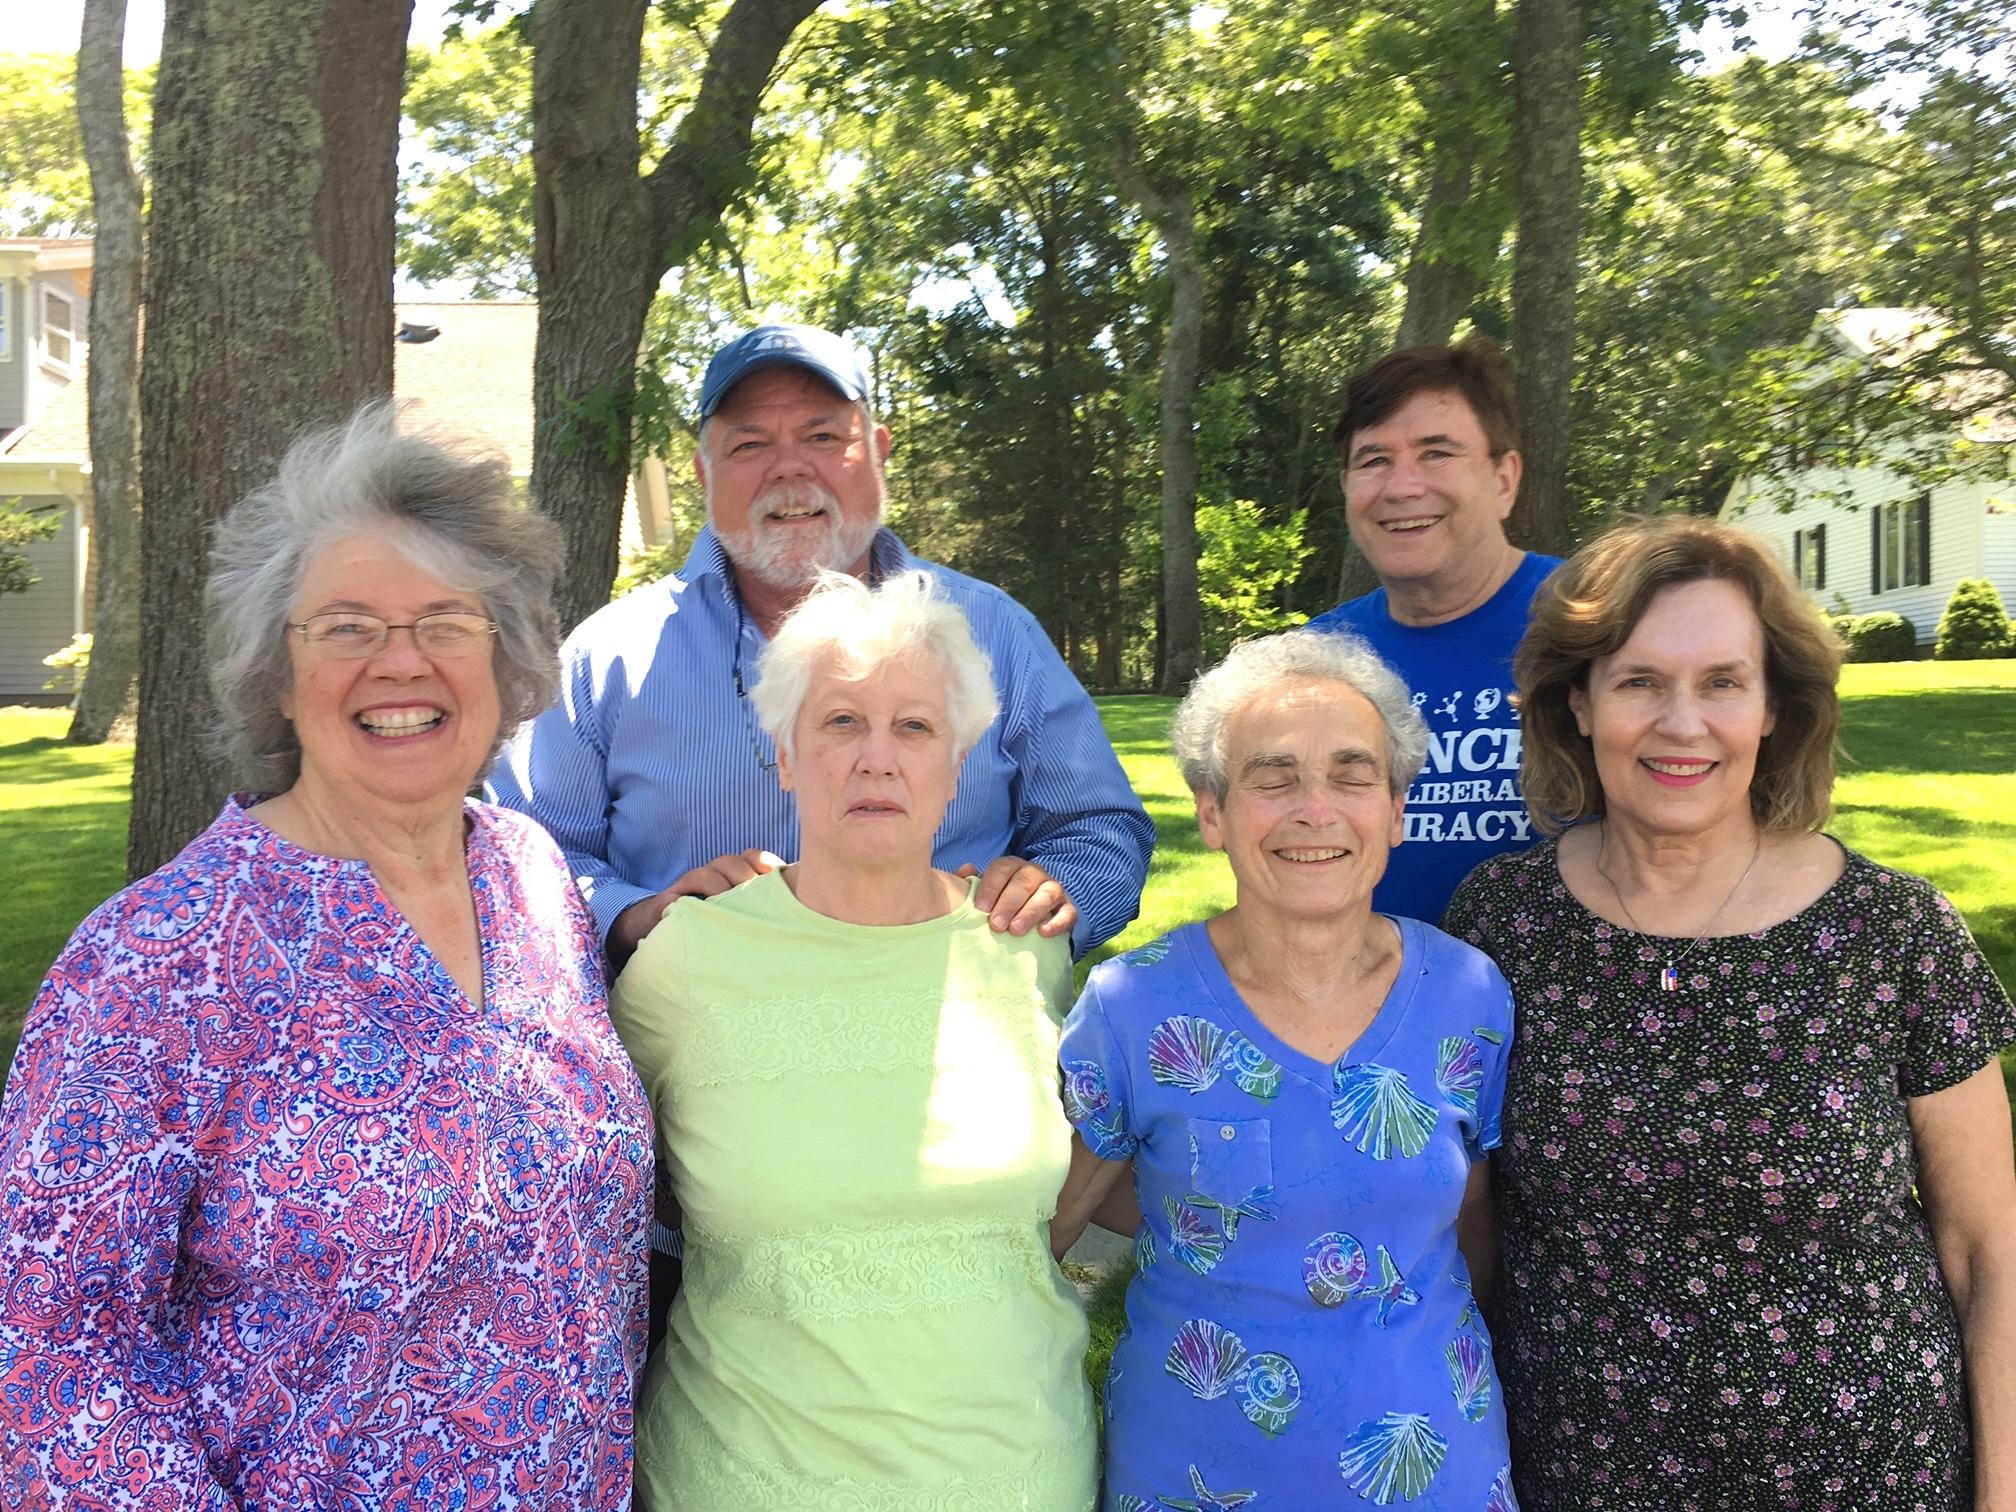 2018:  Betsy, Dave, Chris, Kathy, John, & Lorraine